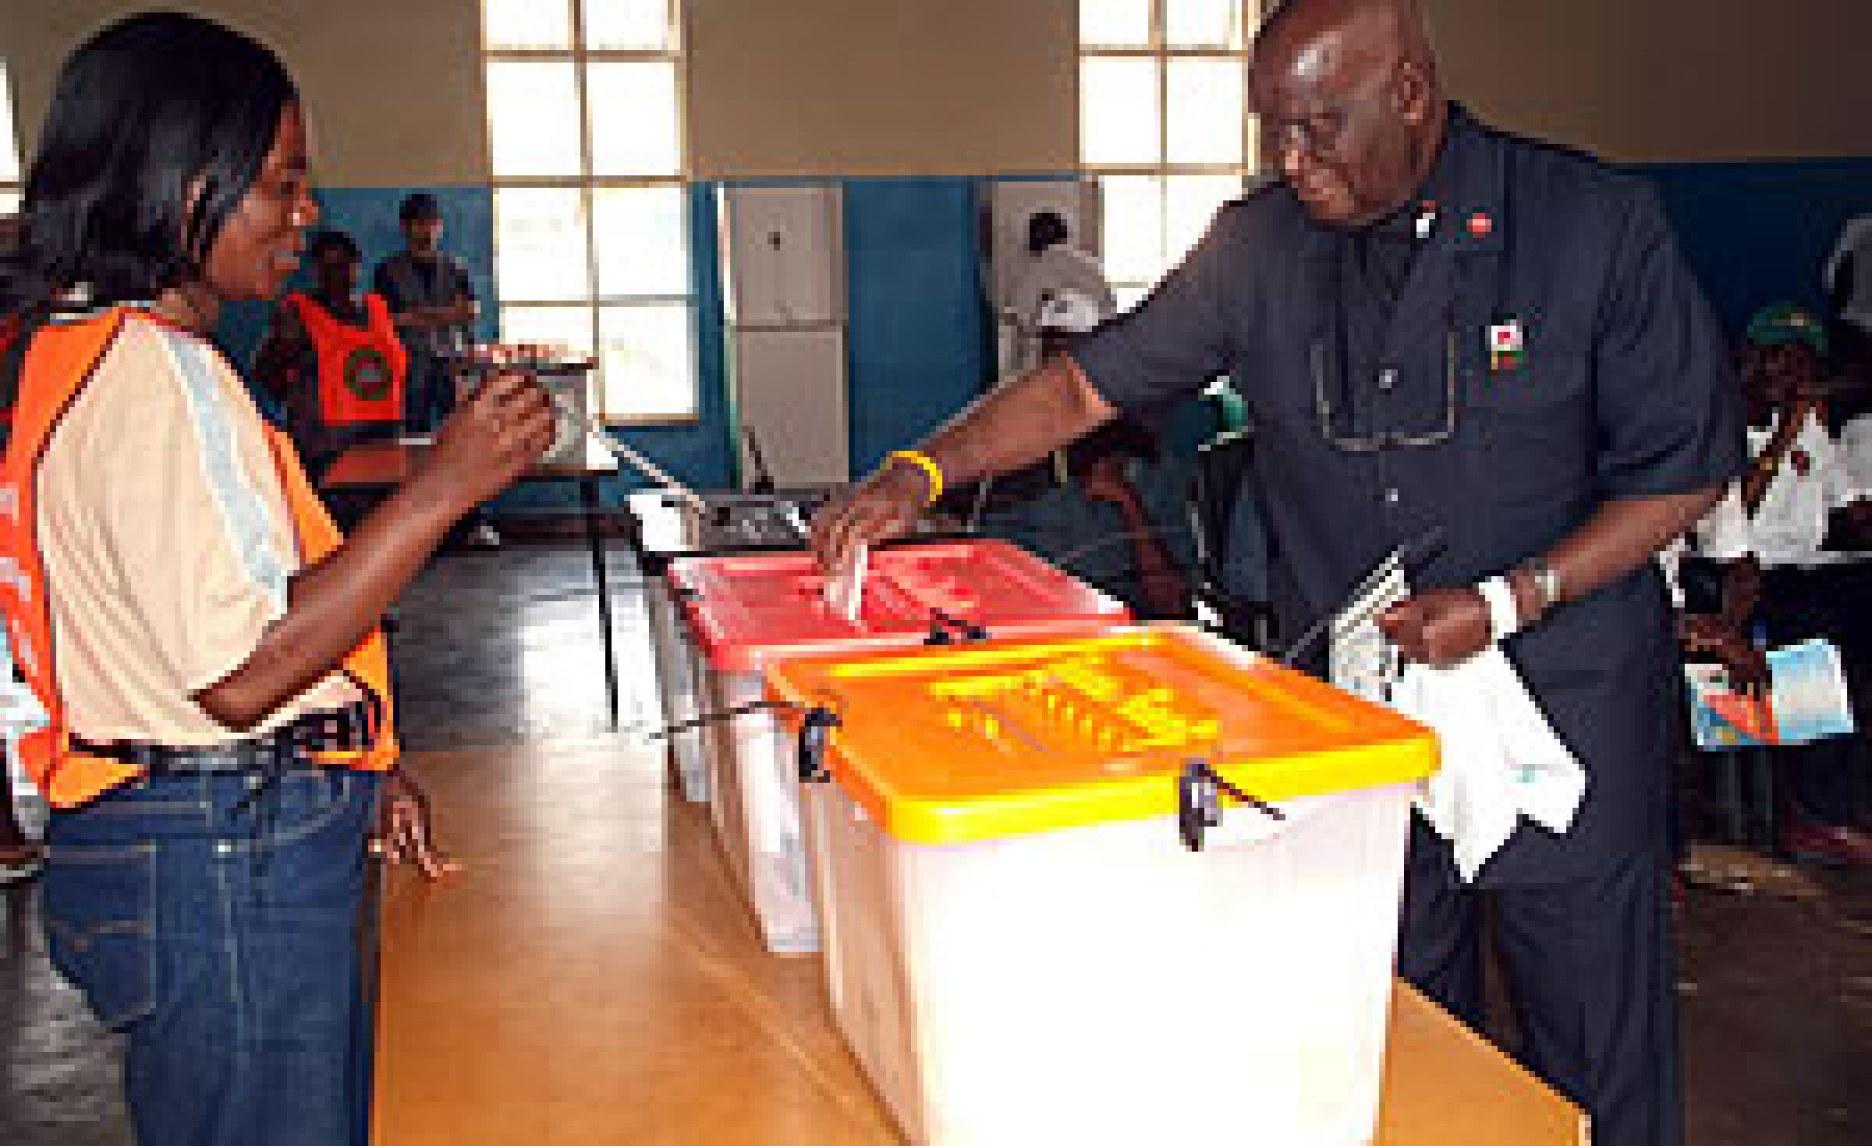 Zambia: Former Zambian President Kenneth Kaunda Hospitalised ...